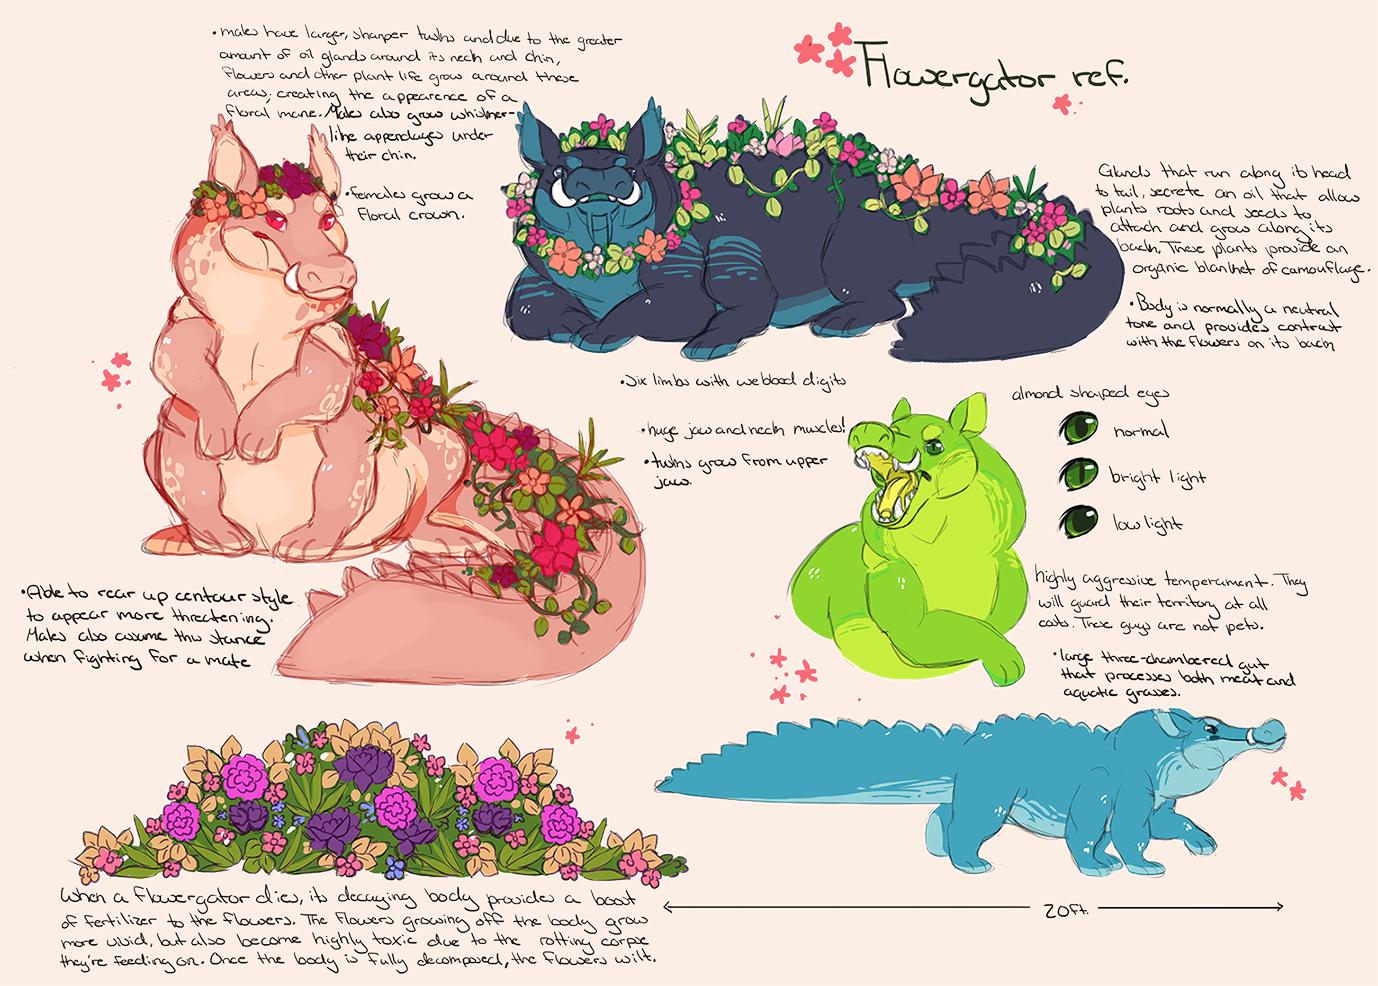 Flowergator Ref. by CitrusFoam